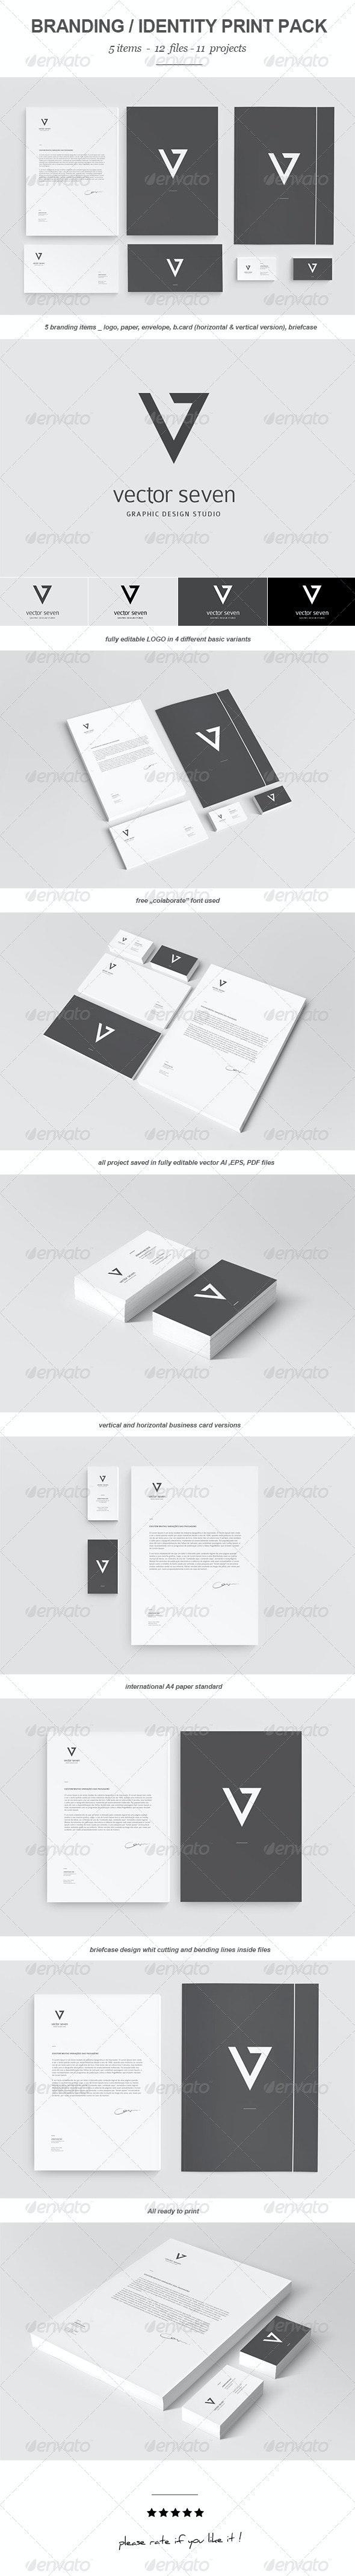 Seven Vector Branding Print Pack - Stationery Print Templates